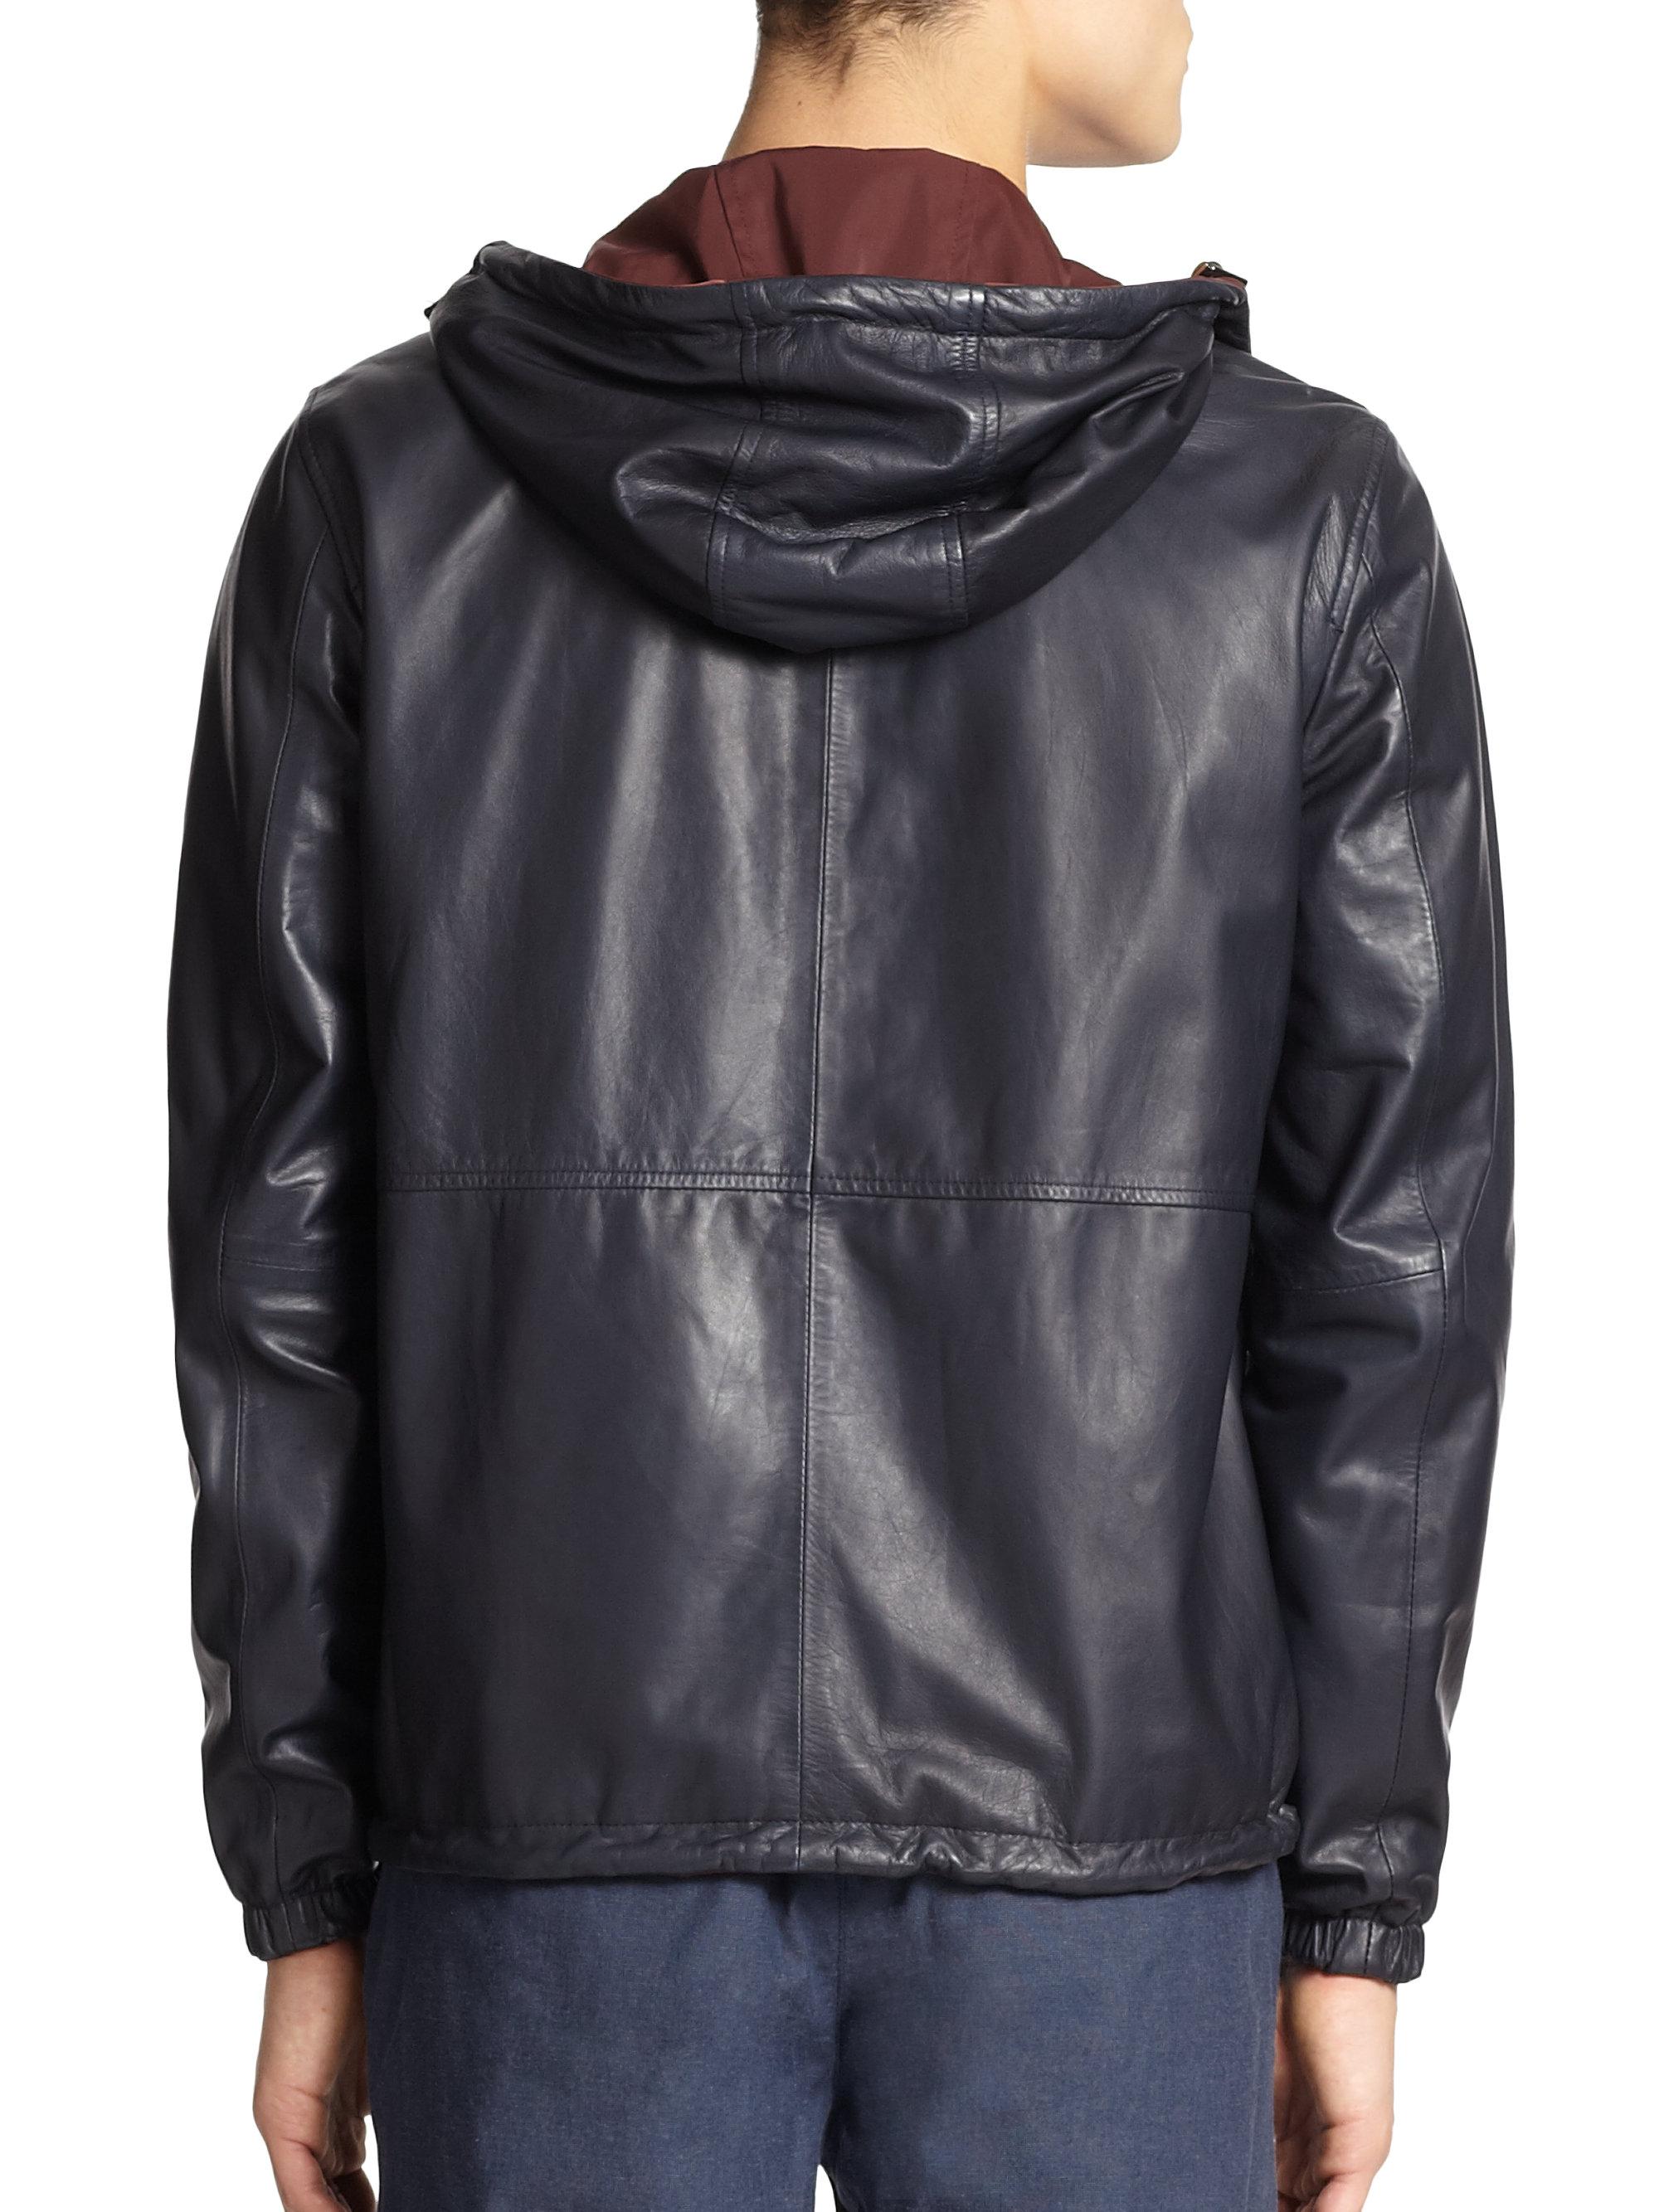 Vince Hooded Reversible Leather Jacket In Navy Burgundy